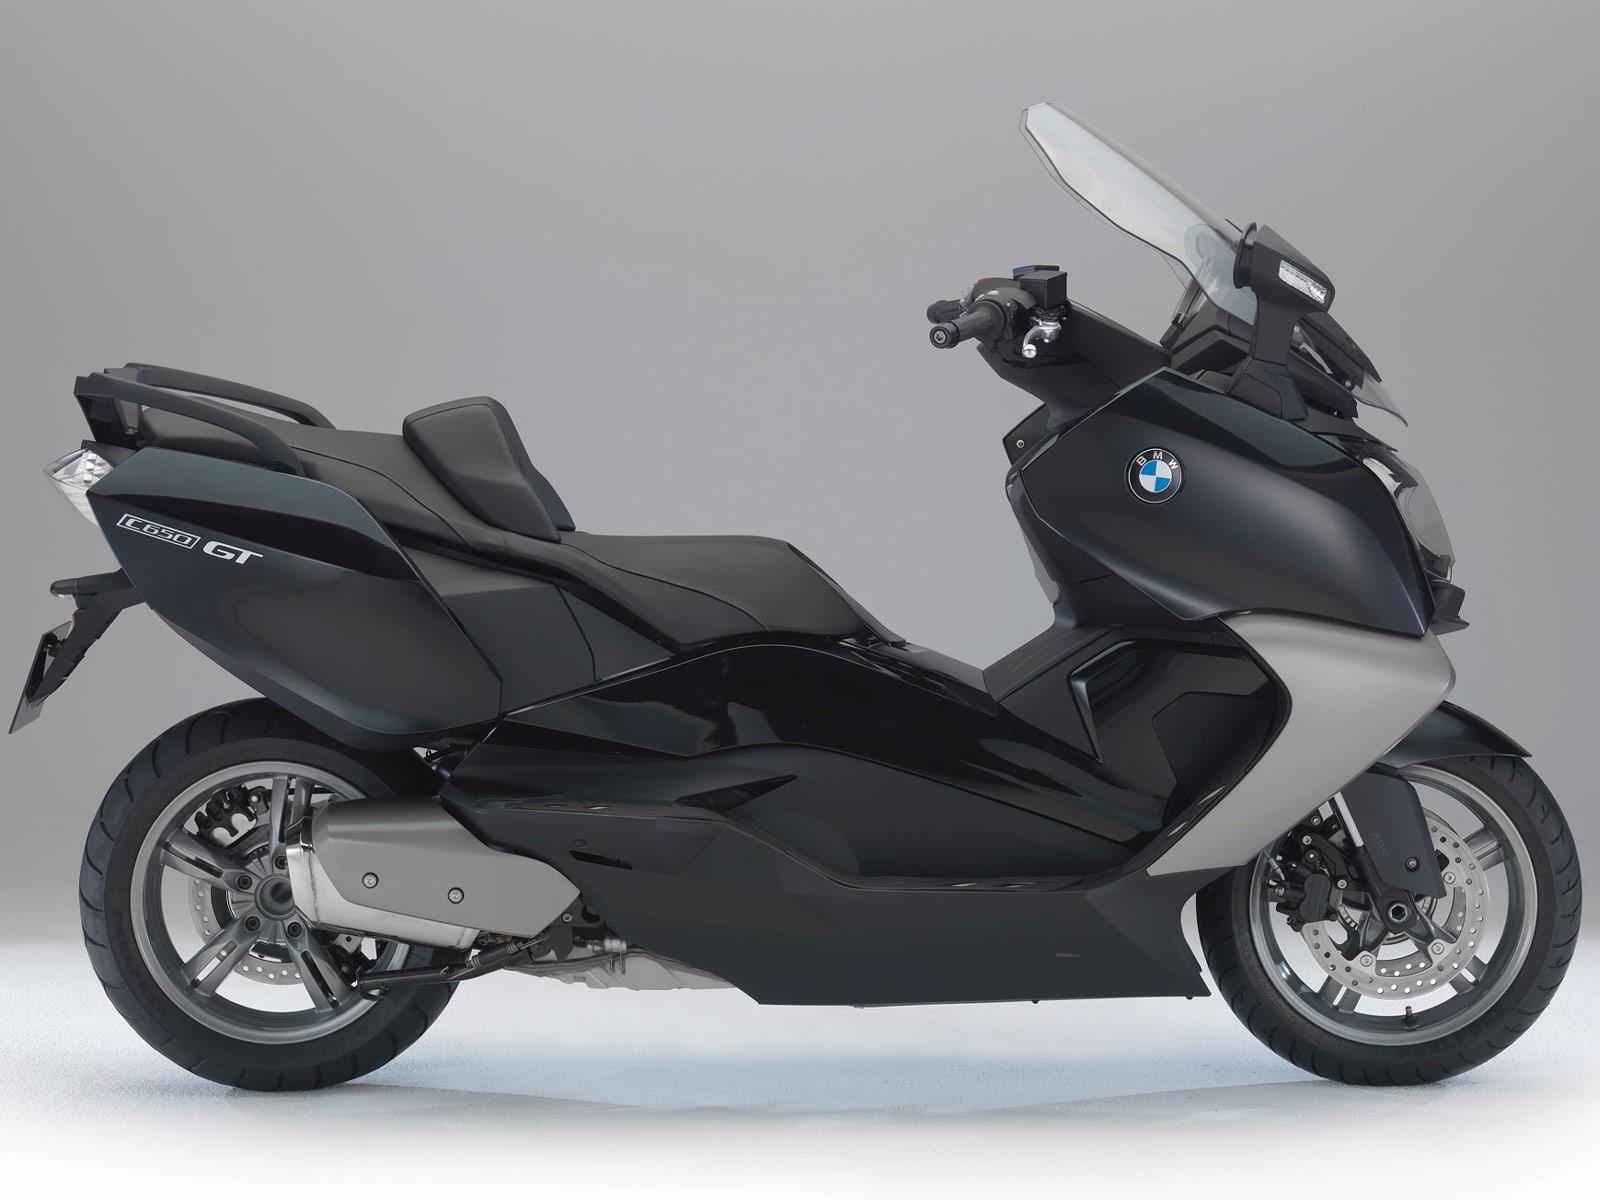 bmw scooter pictures 2012 c650 gt insurance information. Black Bedroom Furniture Sets. Home Design Ideas